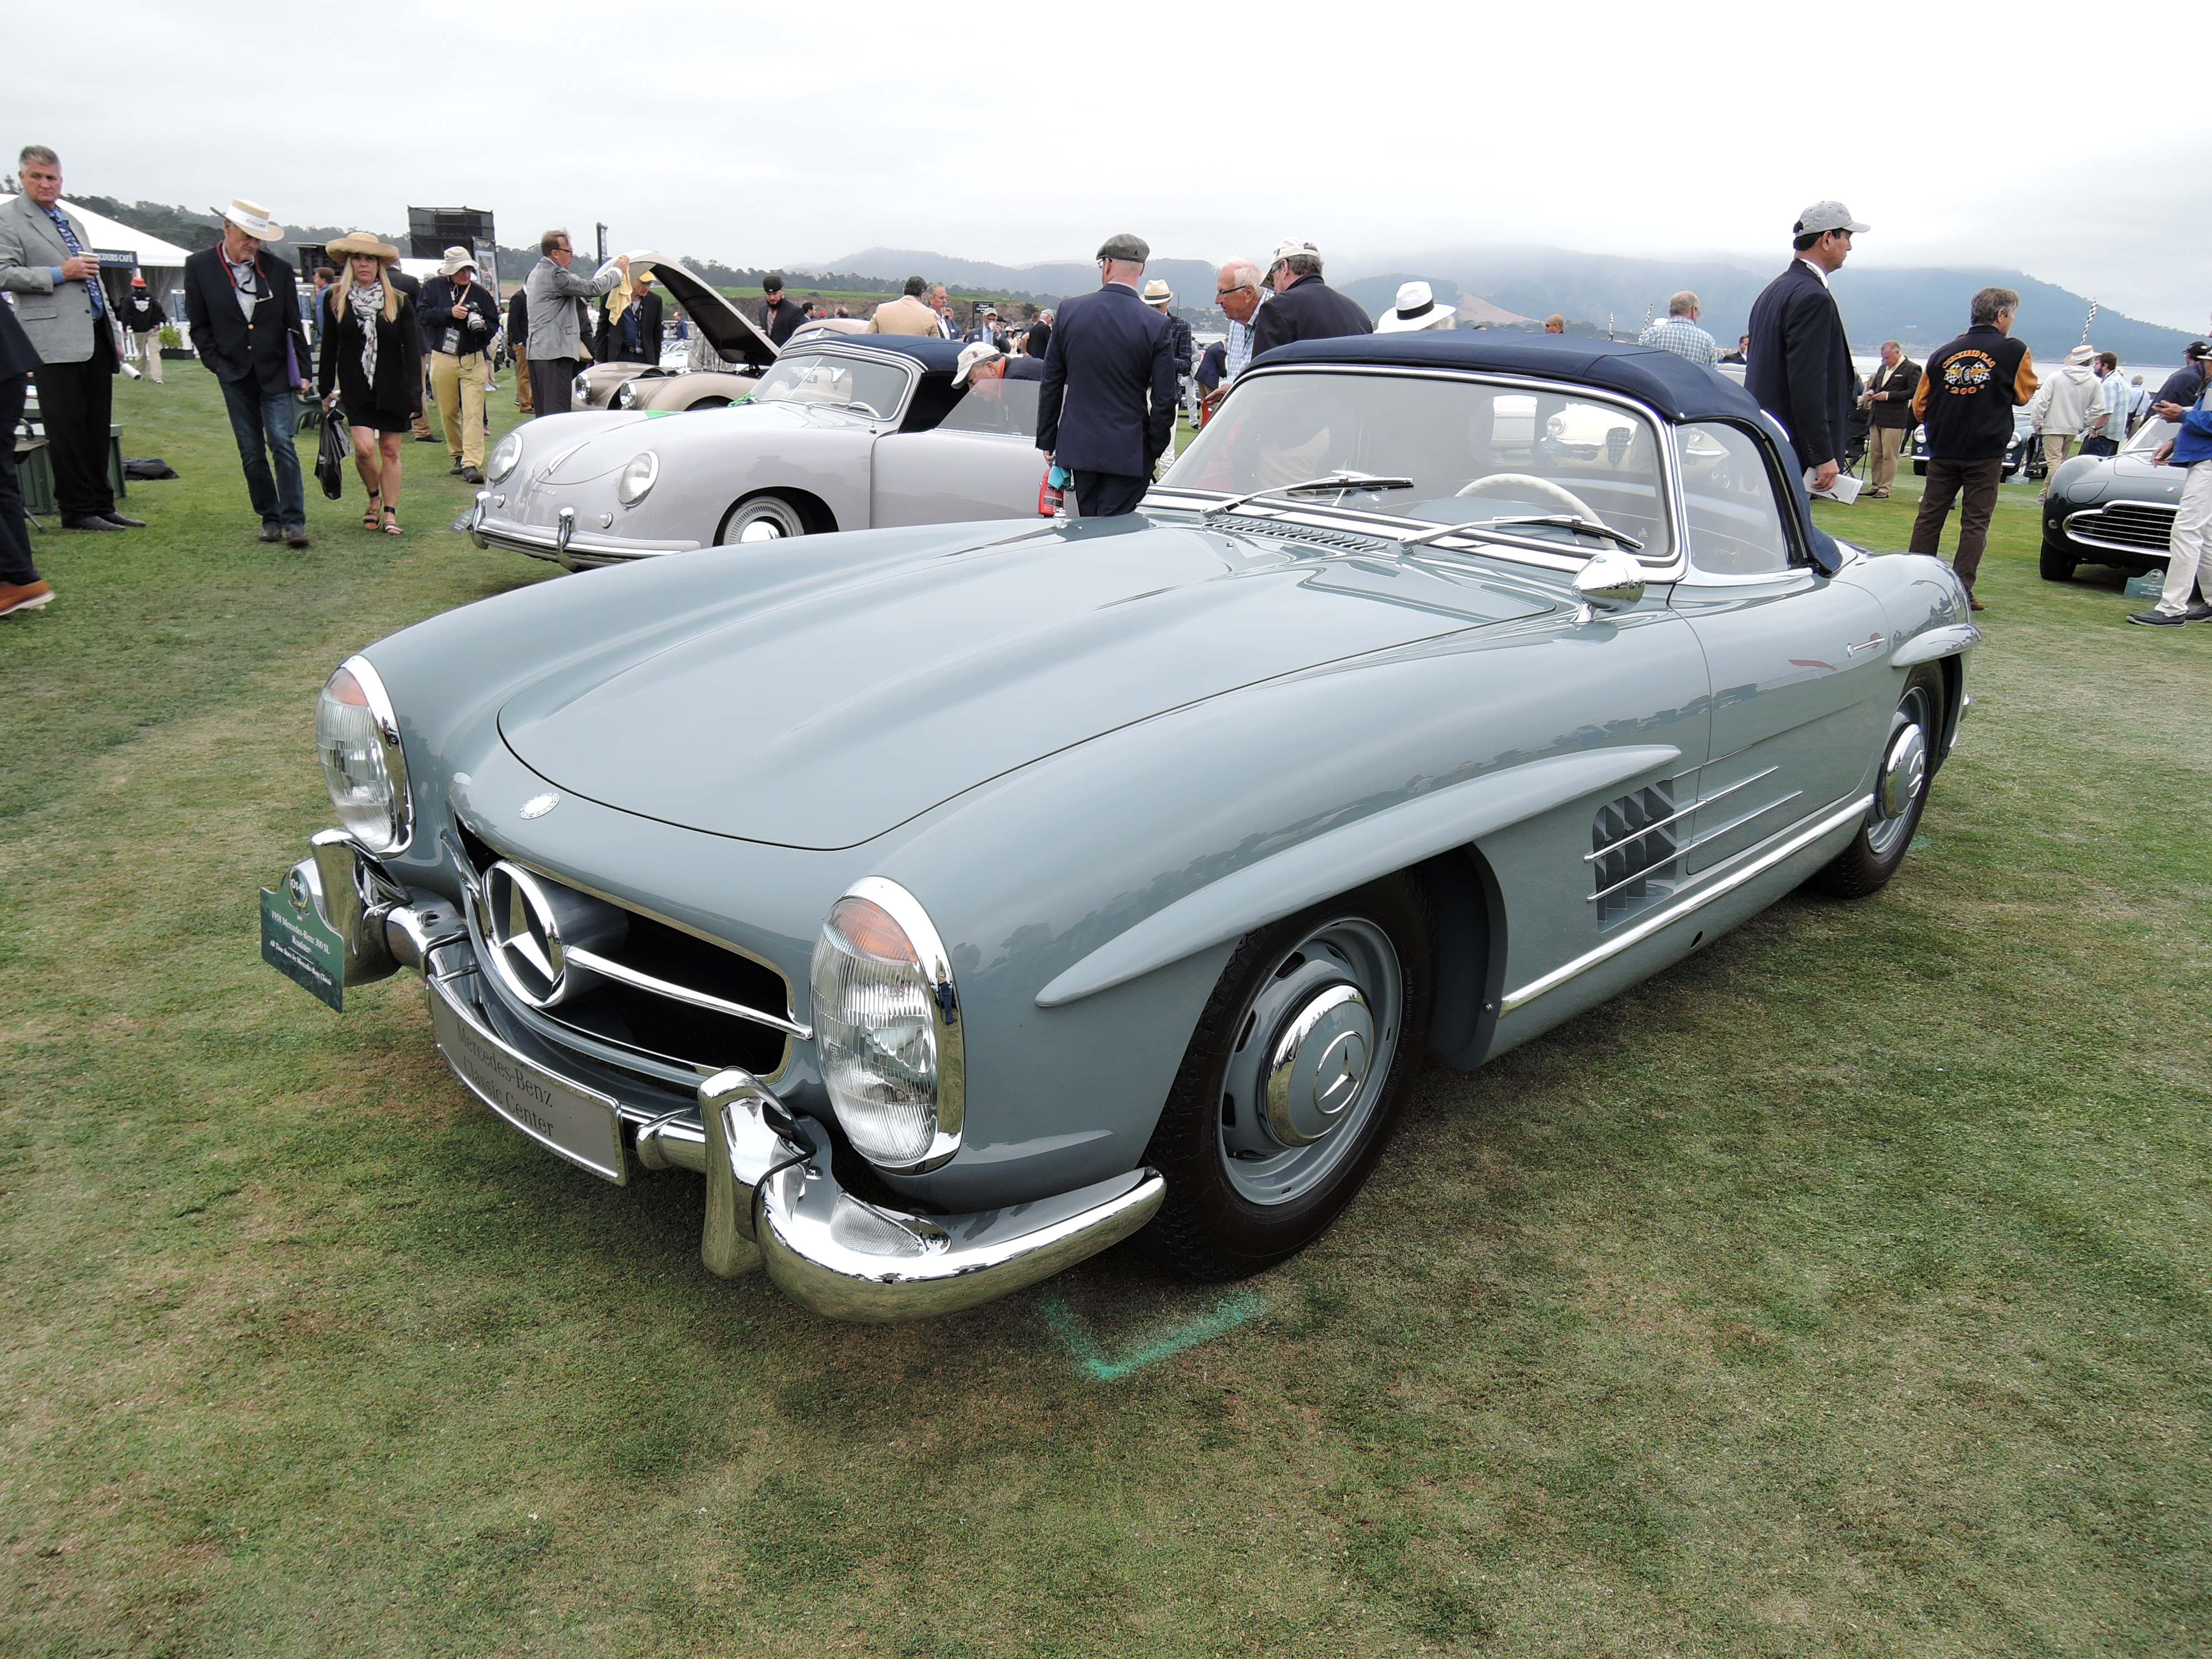 blue/gray 1958 Mercedes-Benz 300 SL Roadster - Pebble Beach Concours d'Elegance 2017